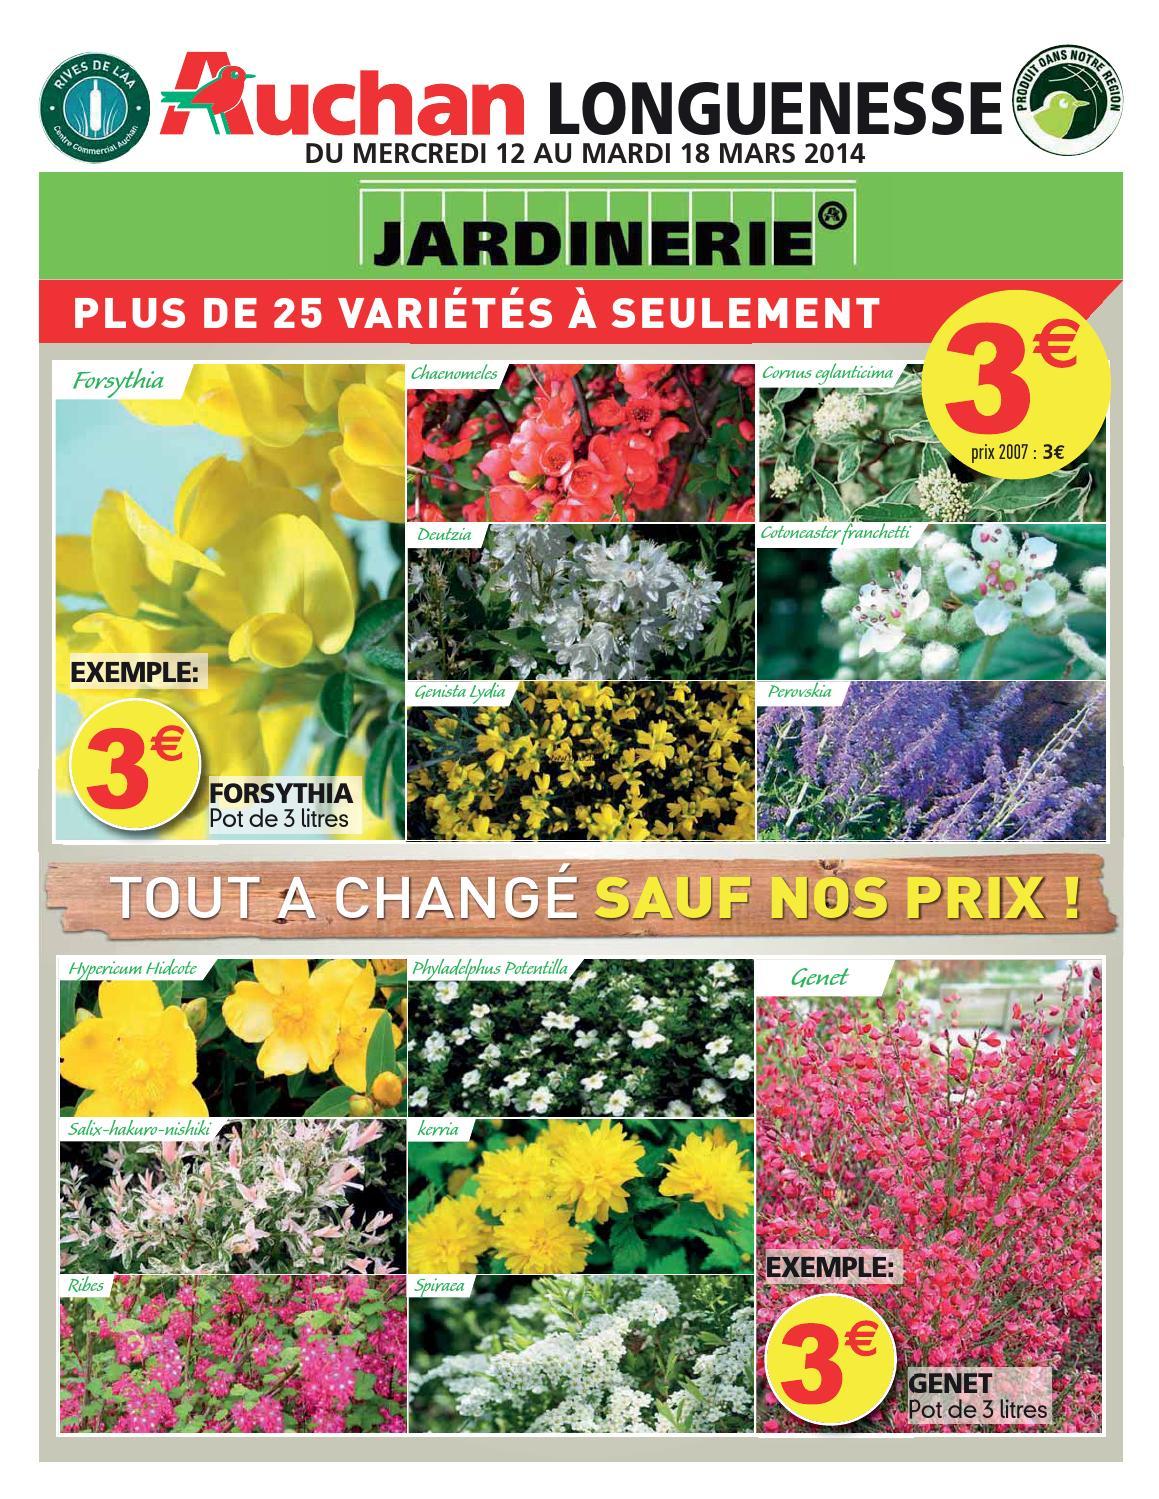 Catalogue Auchan 12 au 18 mars by Anti-Crise.fr - issuu